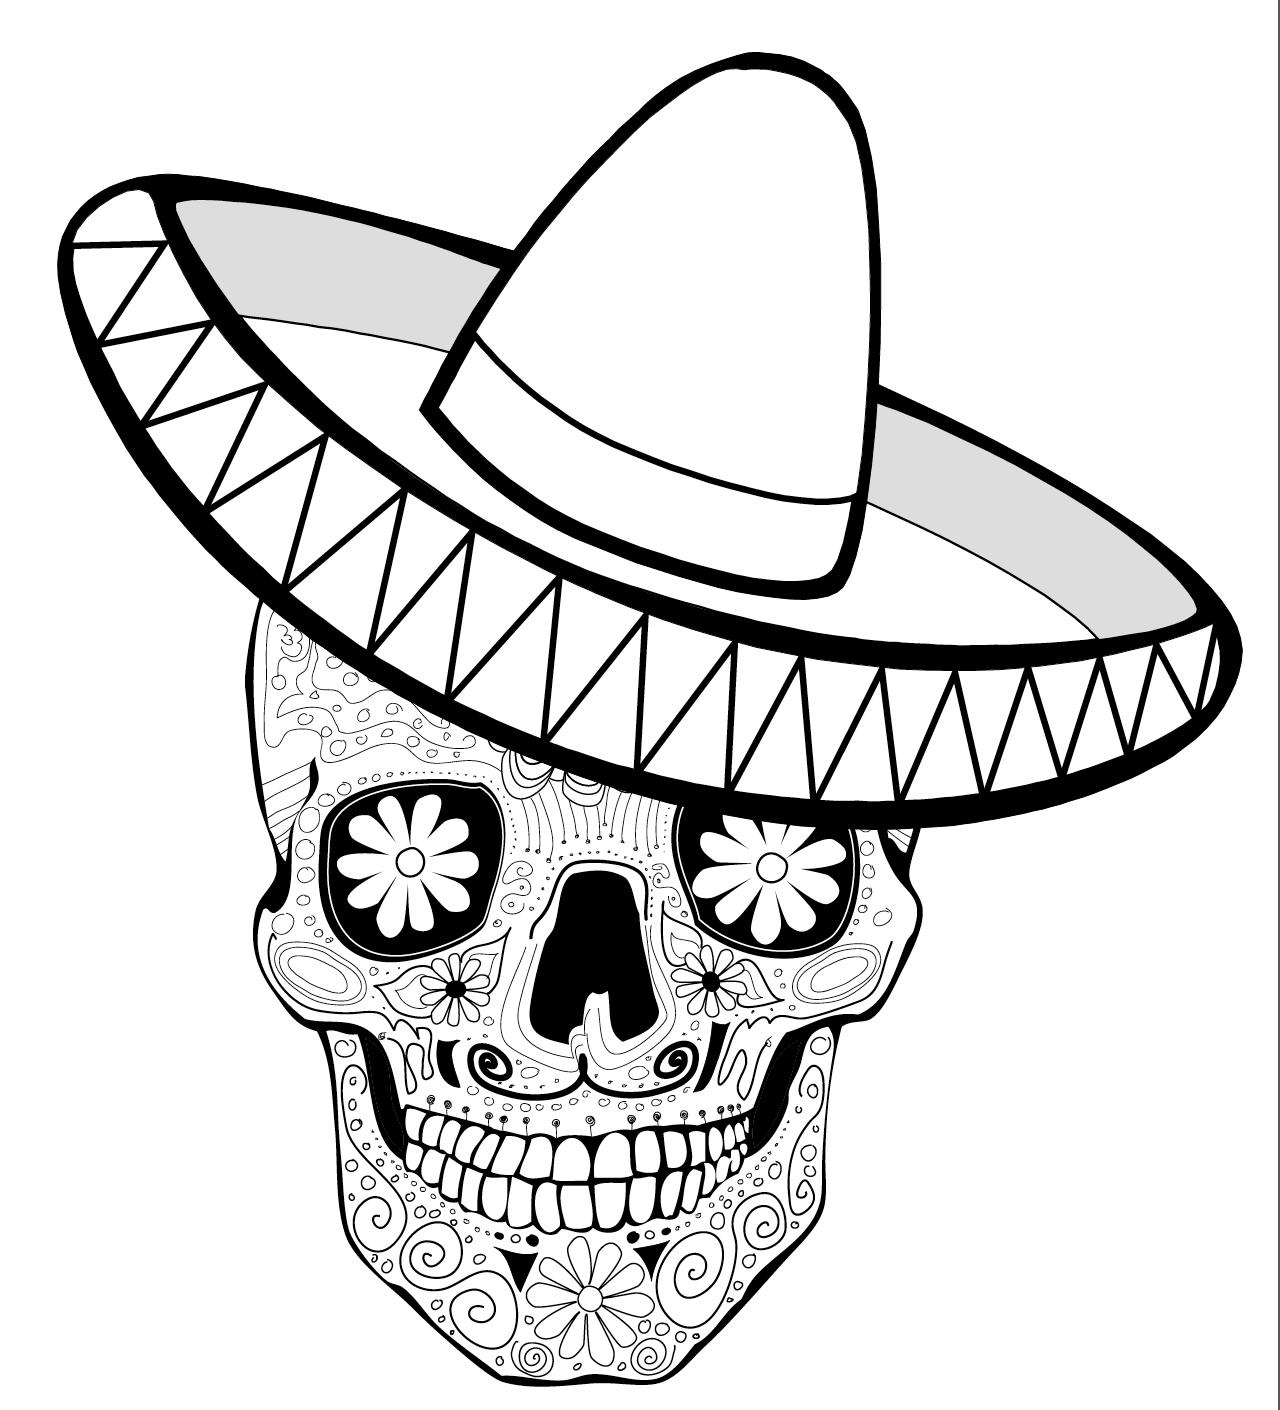 Sombrero Coloring Pages Sketch Coloring Page